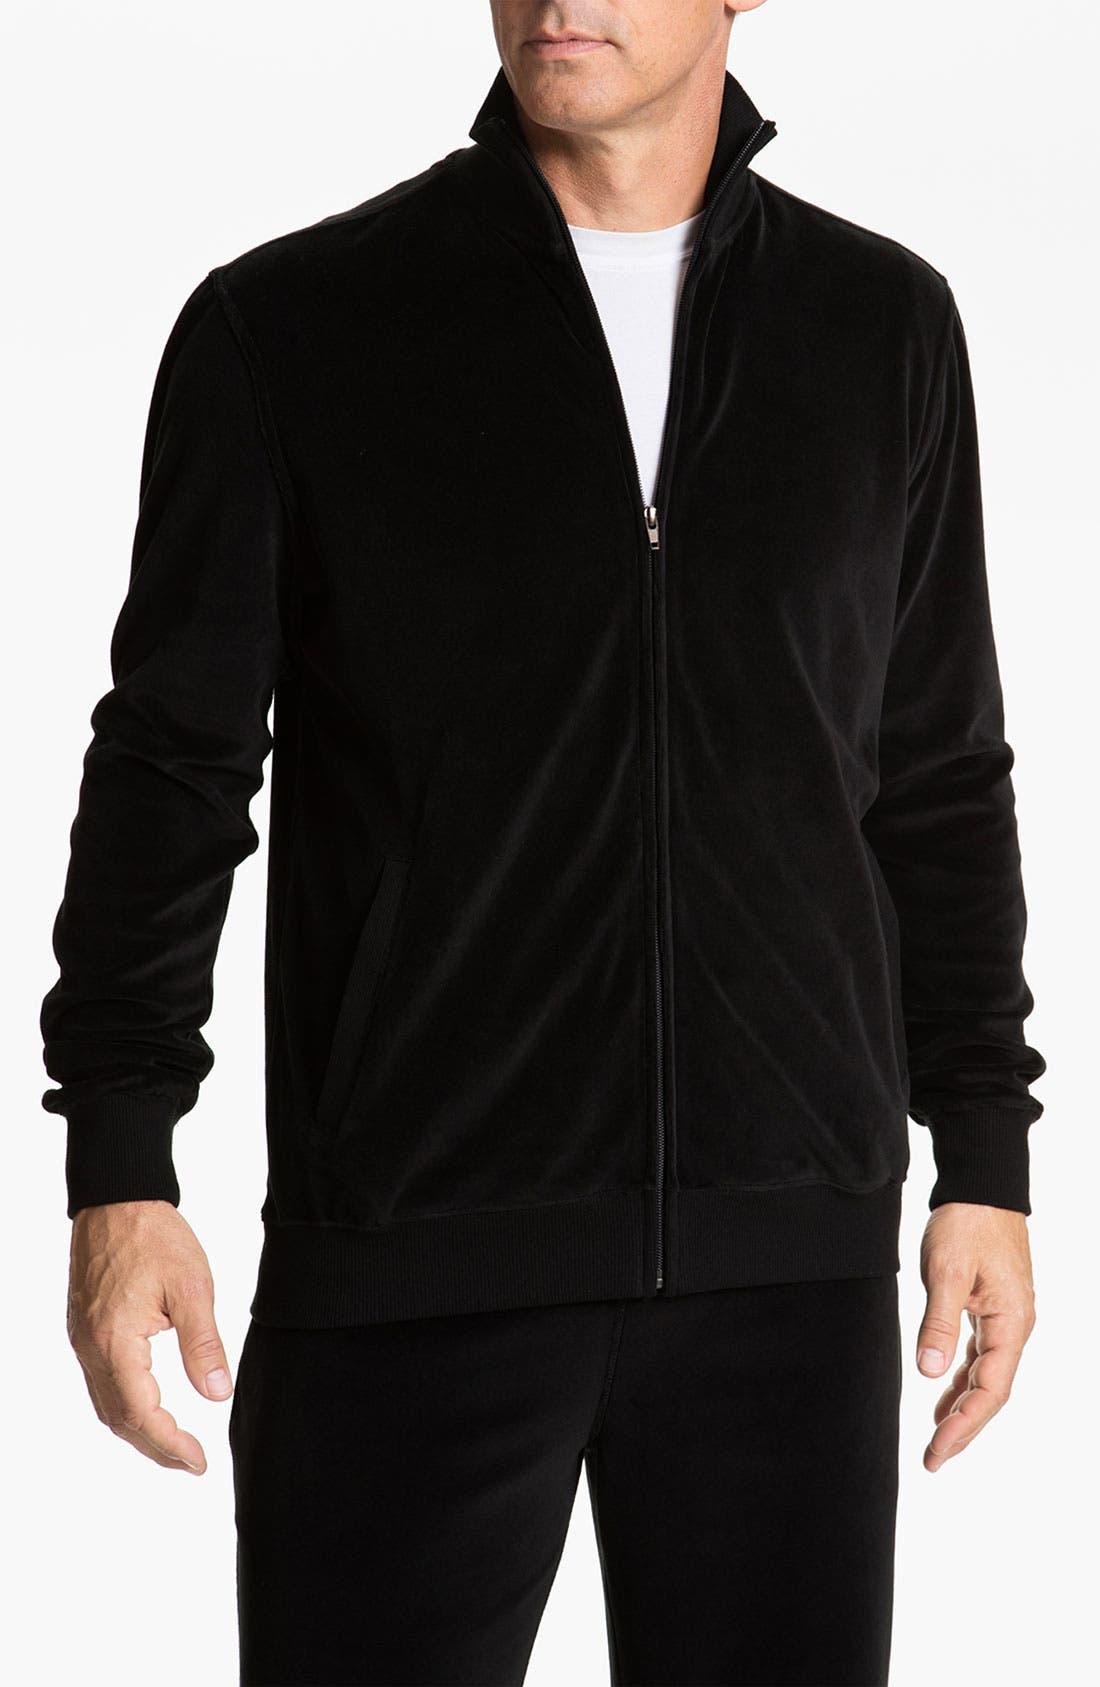 Main Image - Daniel Buchler 'Deluxe' Yarn-Dyed Velour Track Jacket